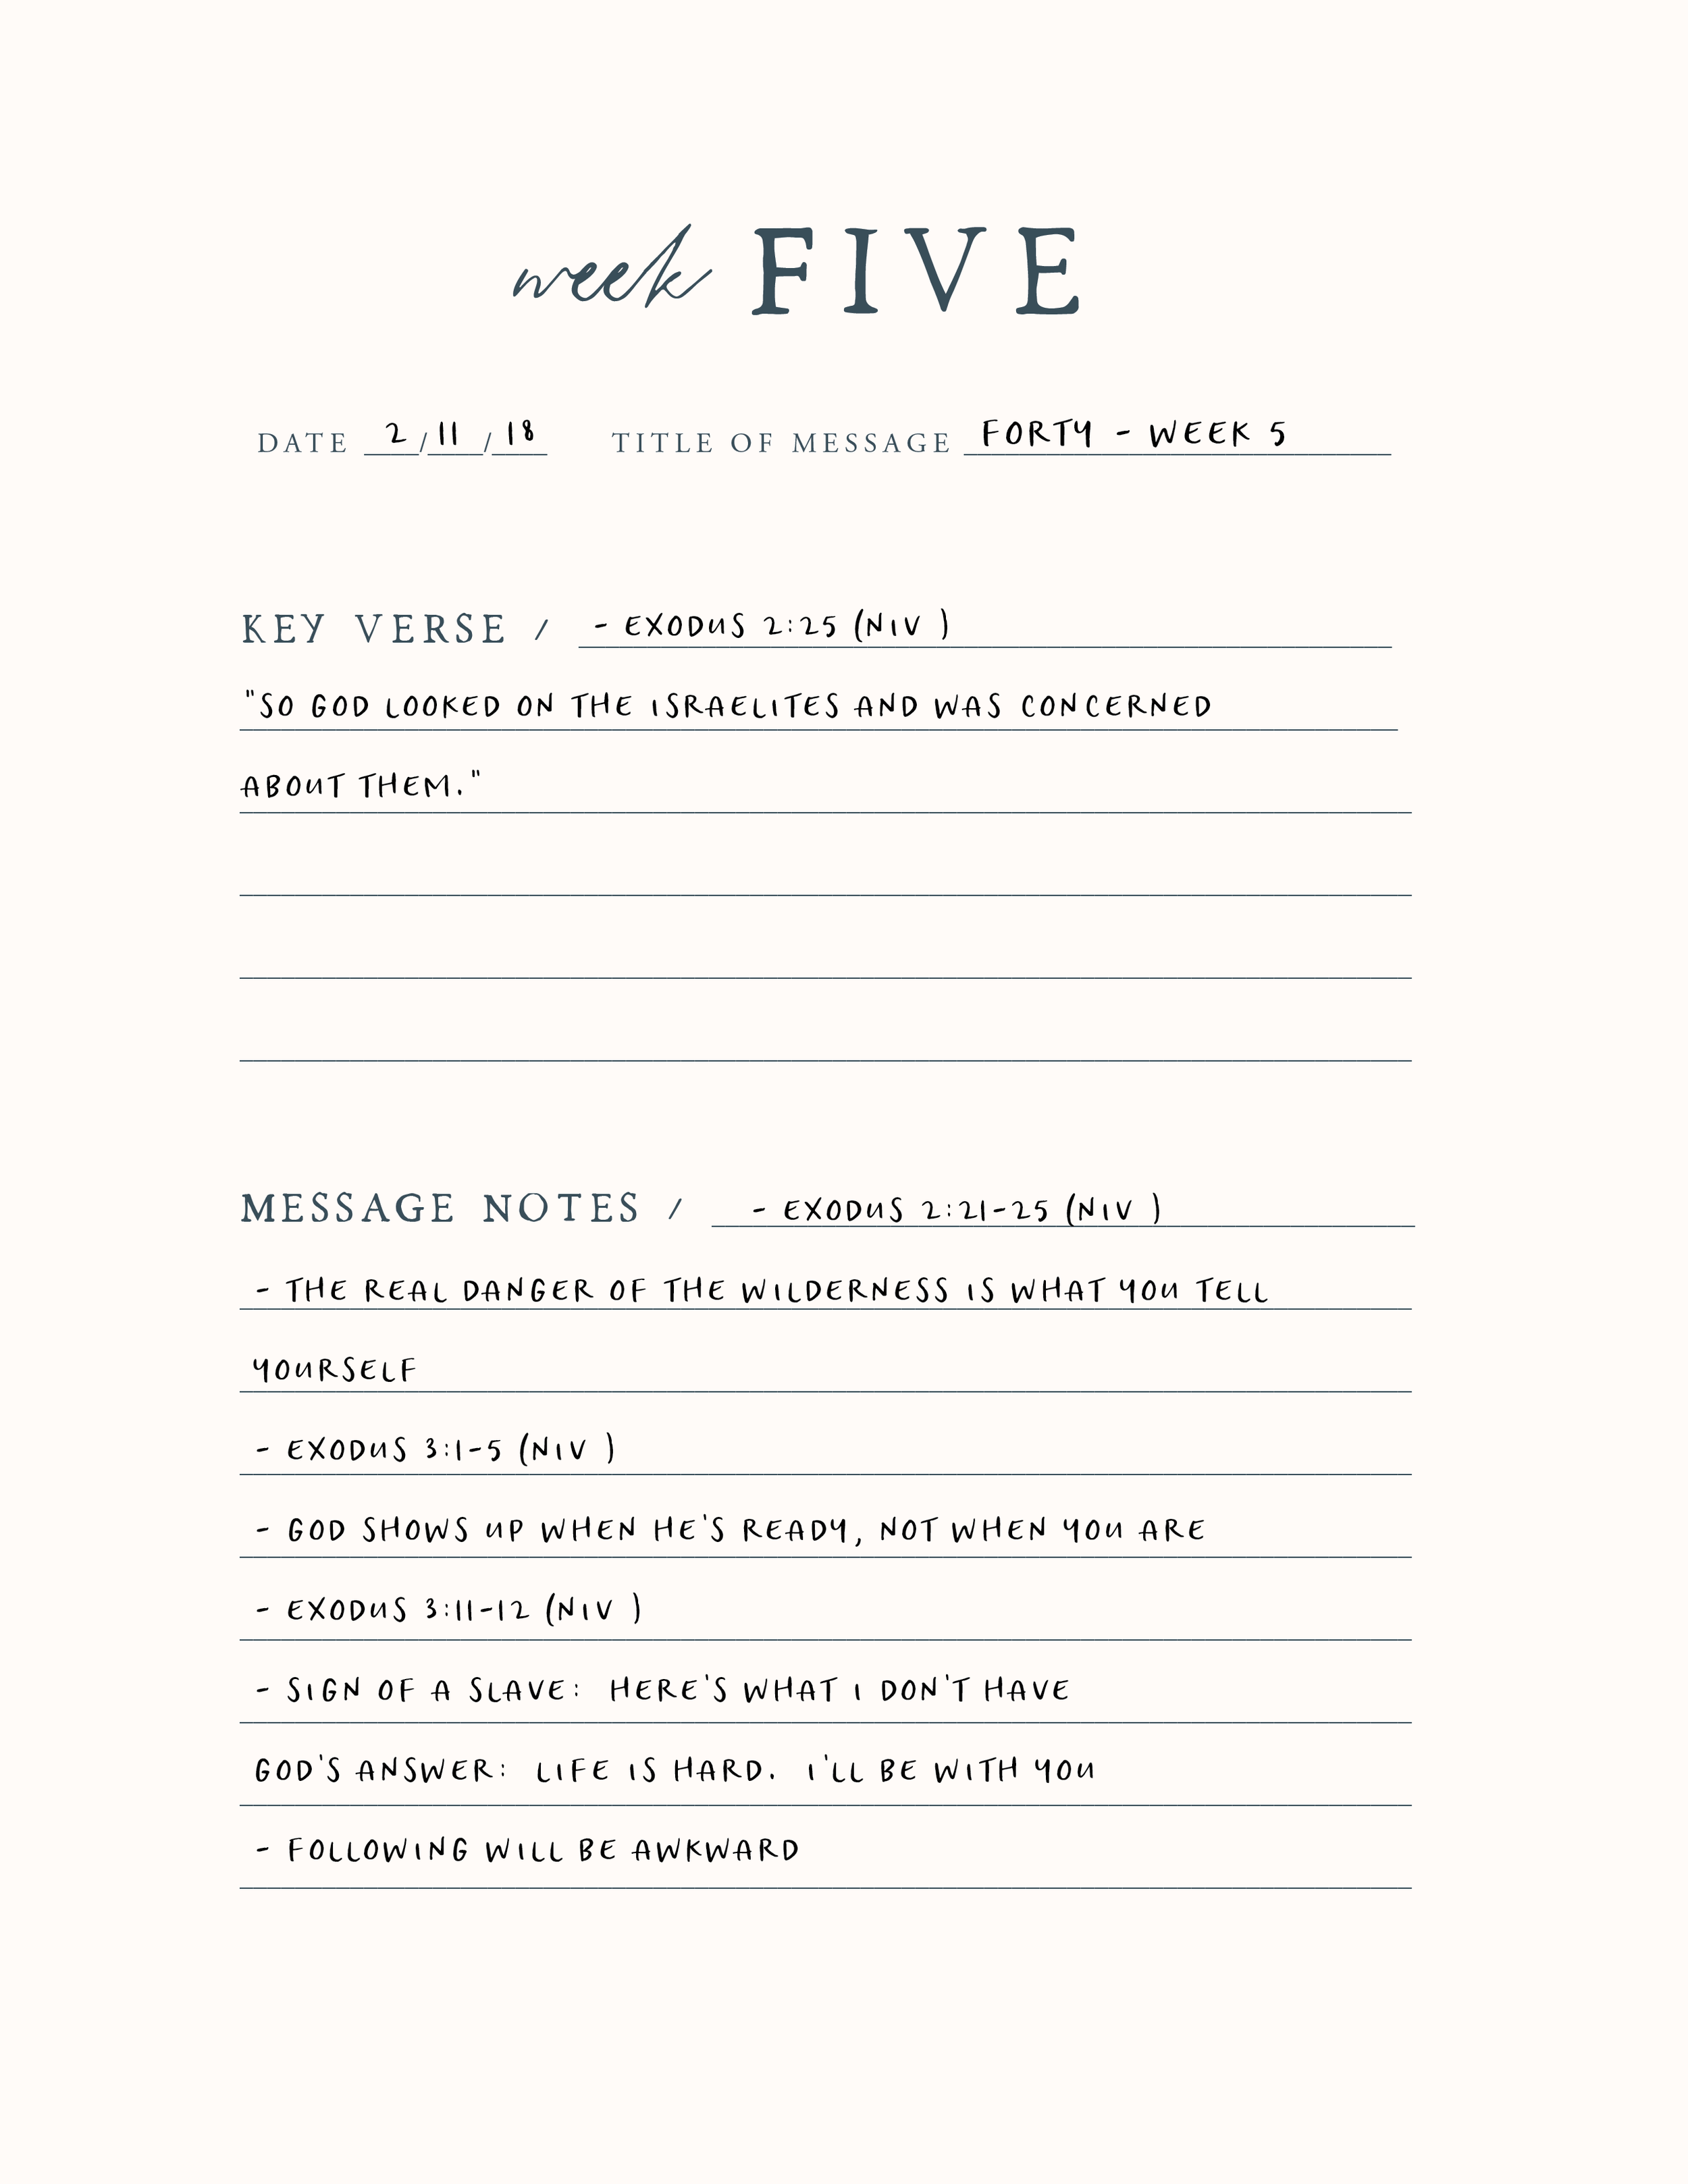 weekfive_notes.png